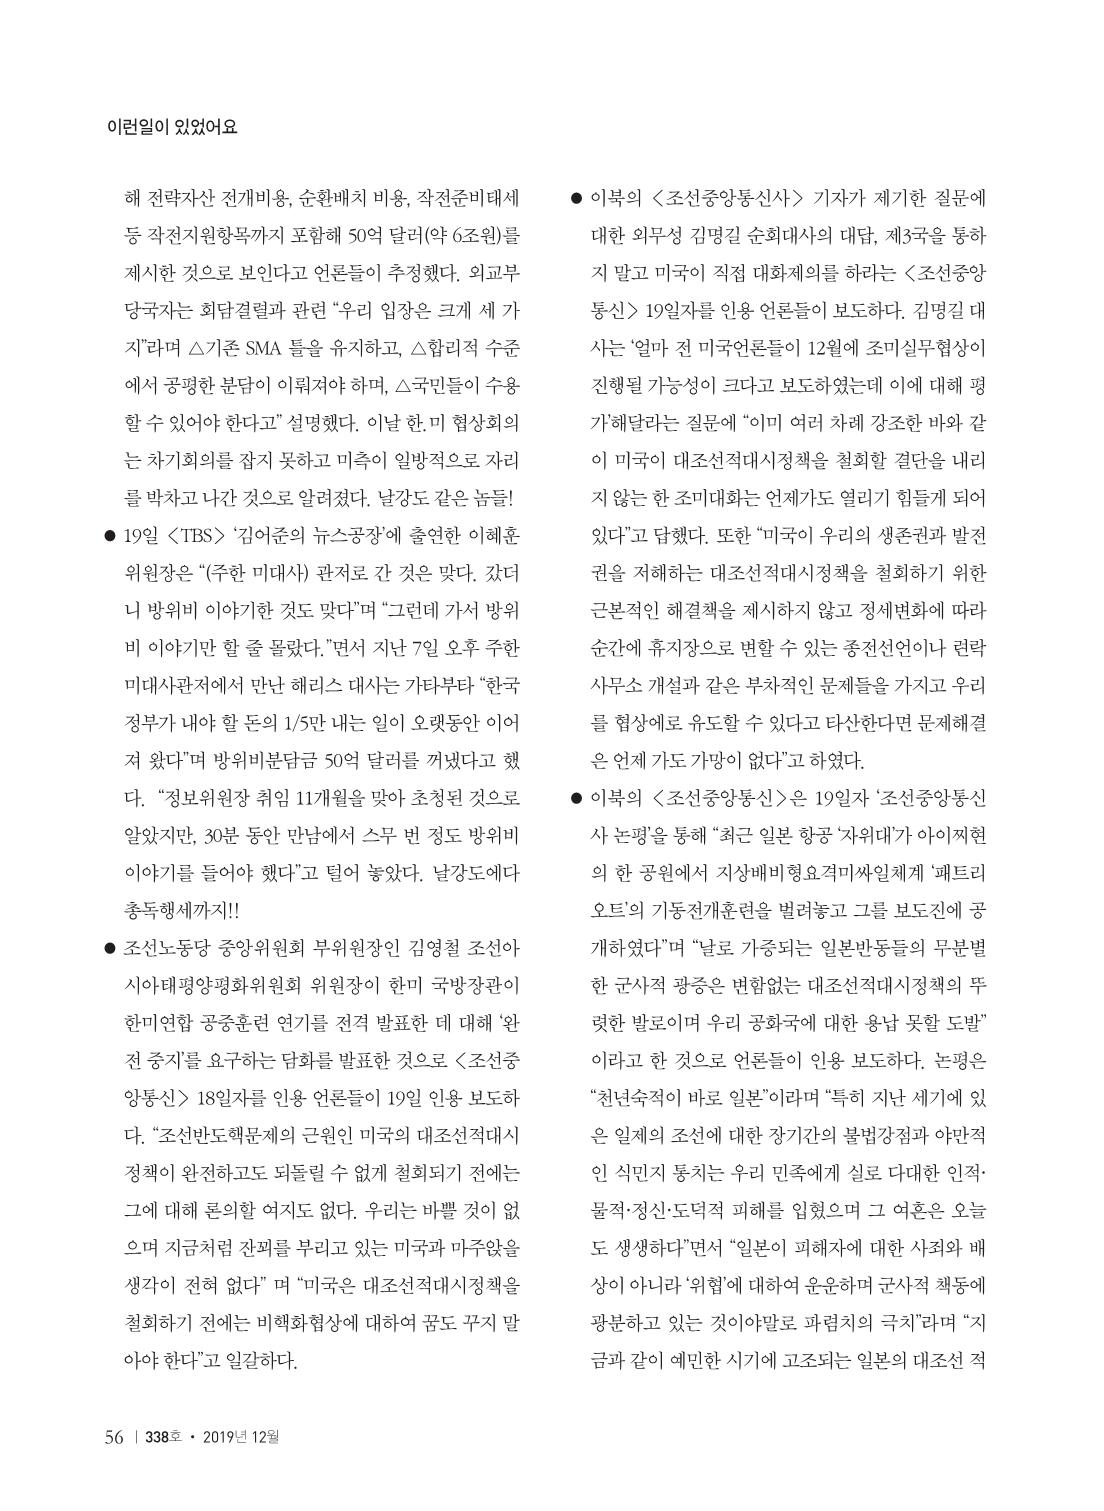 5802db1f-6a90-451c-ac2e-da2a23bee939.pdf-0058.jpg